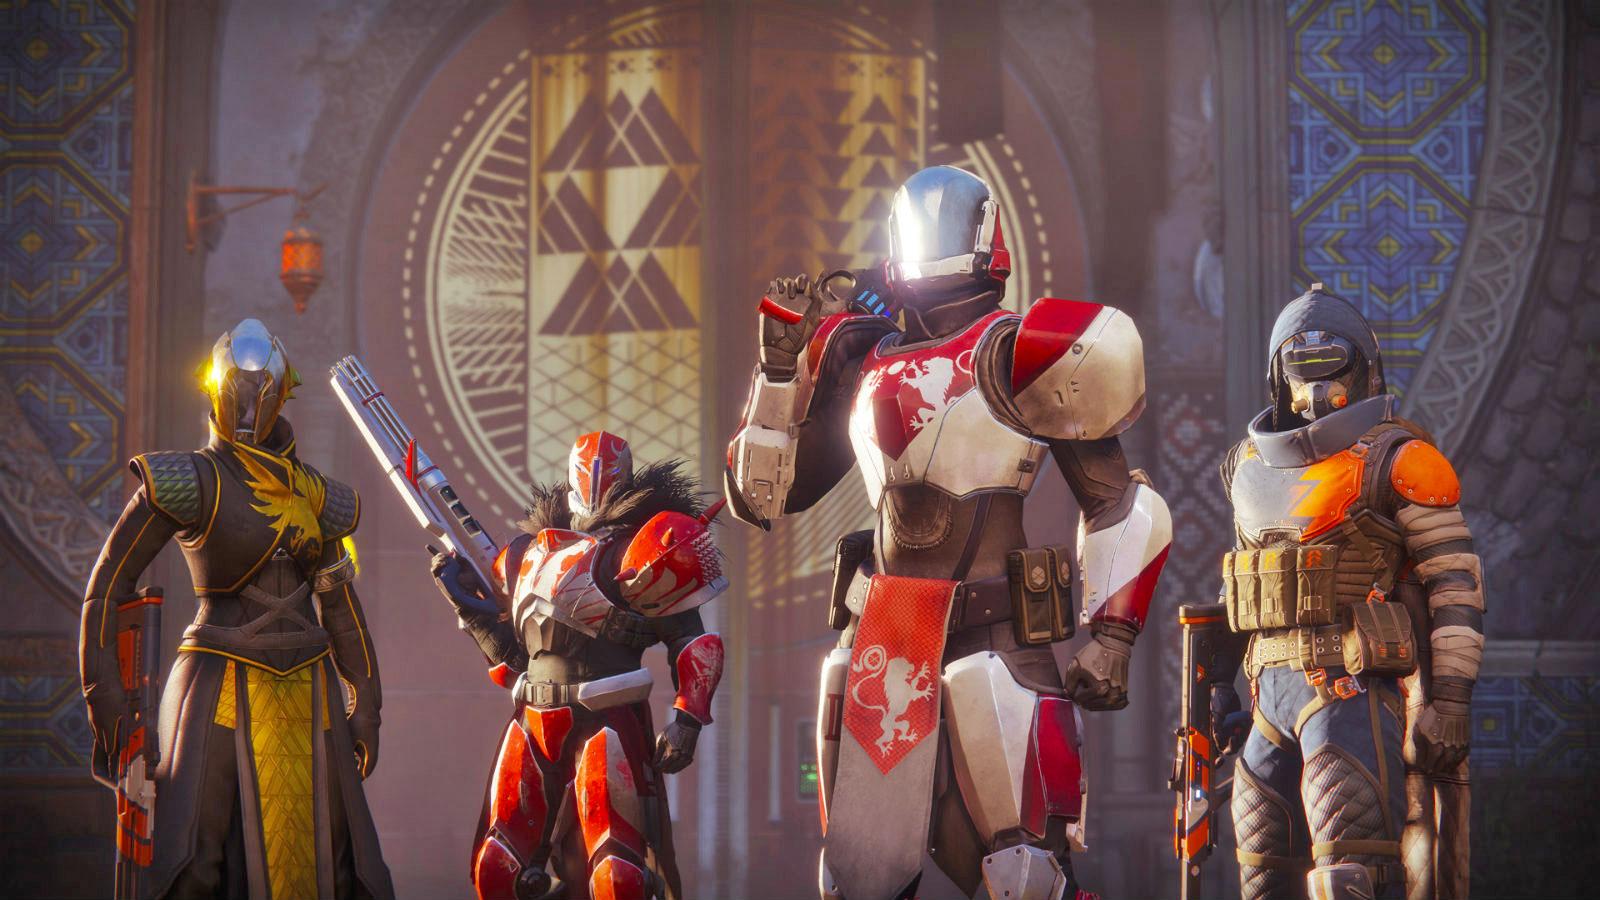 Destiny needs matchmaking for raids